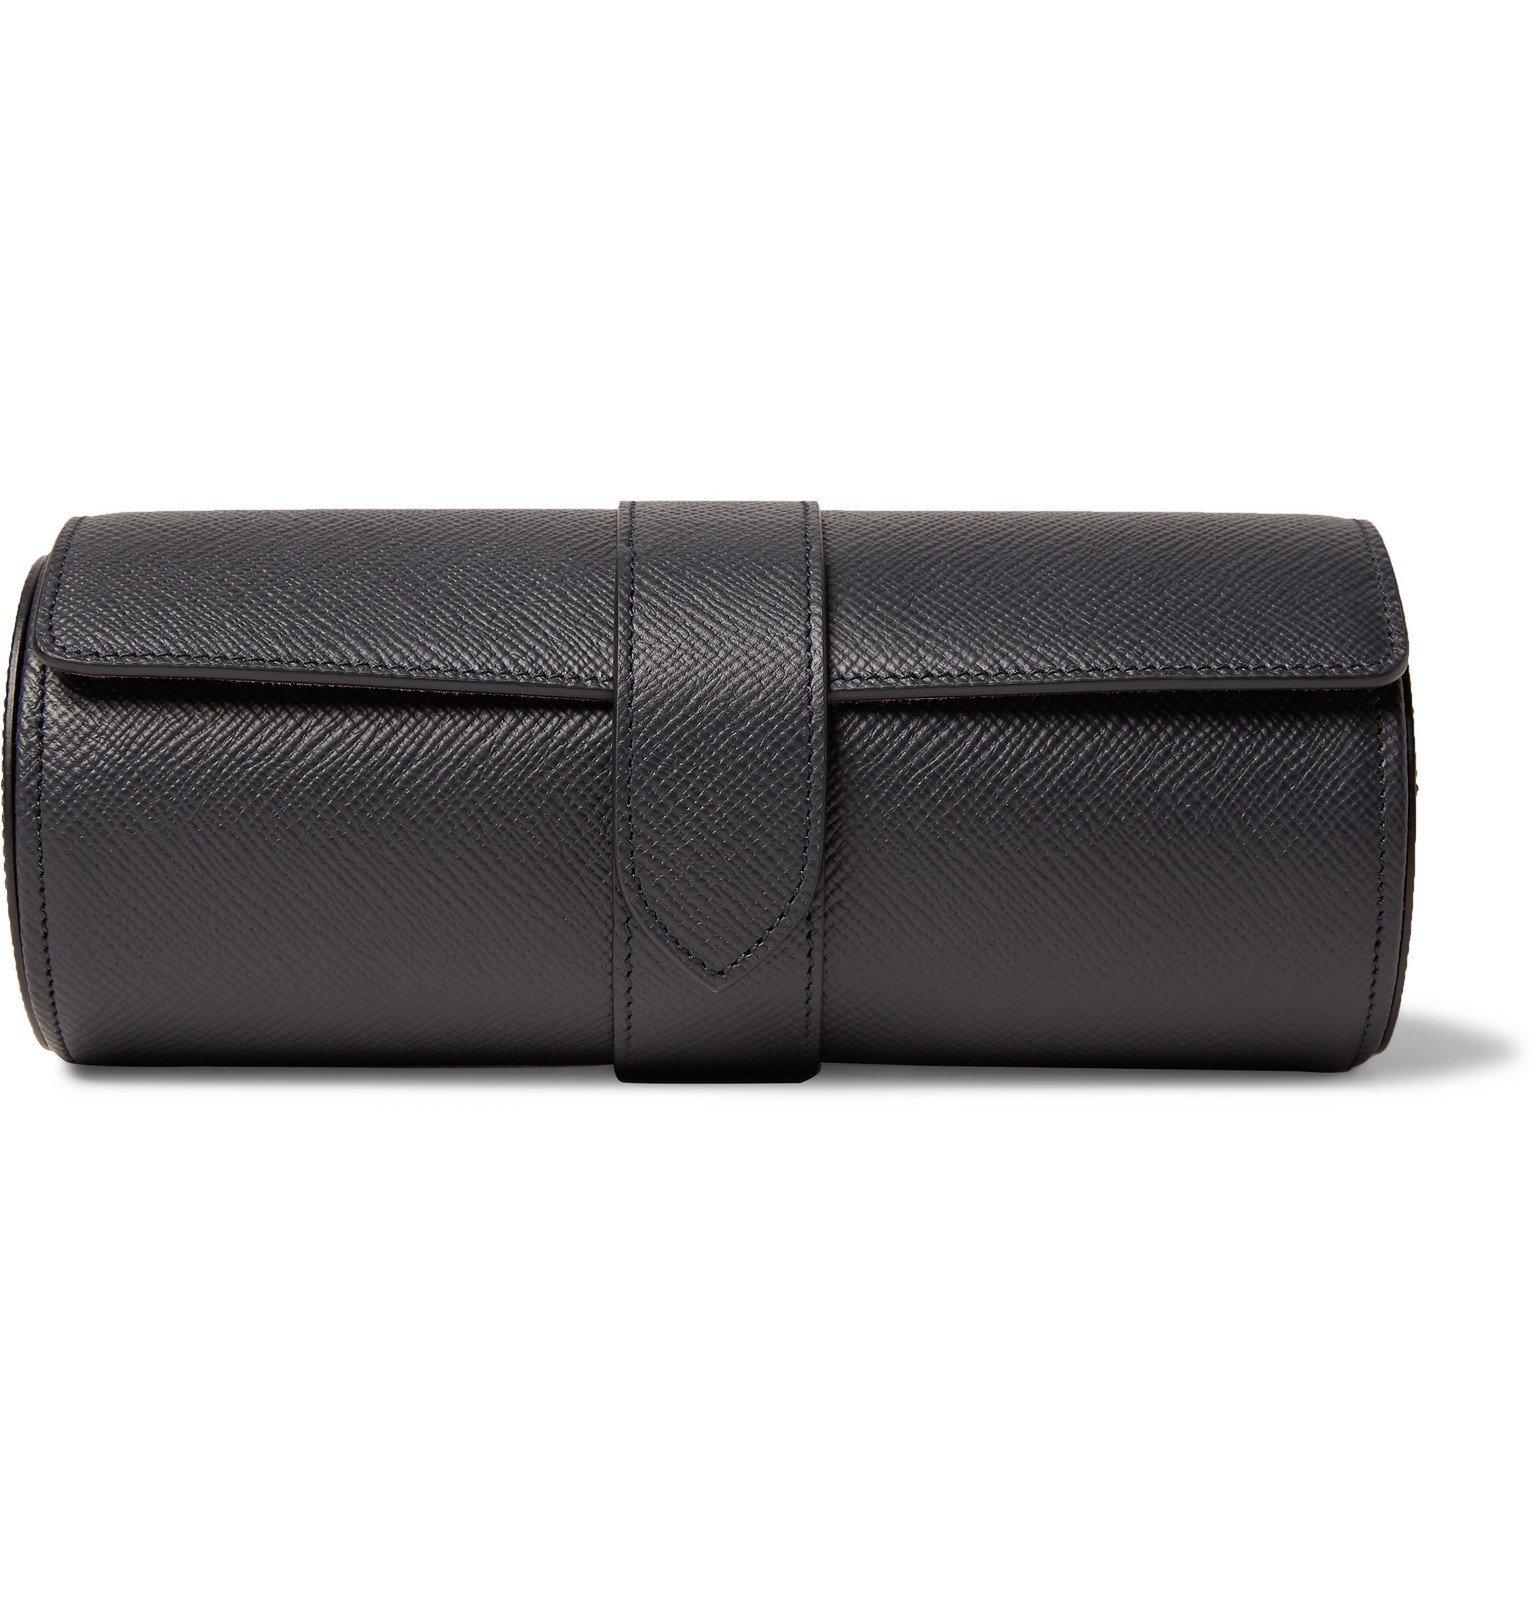 Smythson - Panama Cross-Grain Leather Watch Roll - Blue